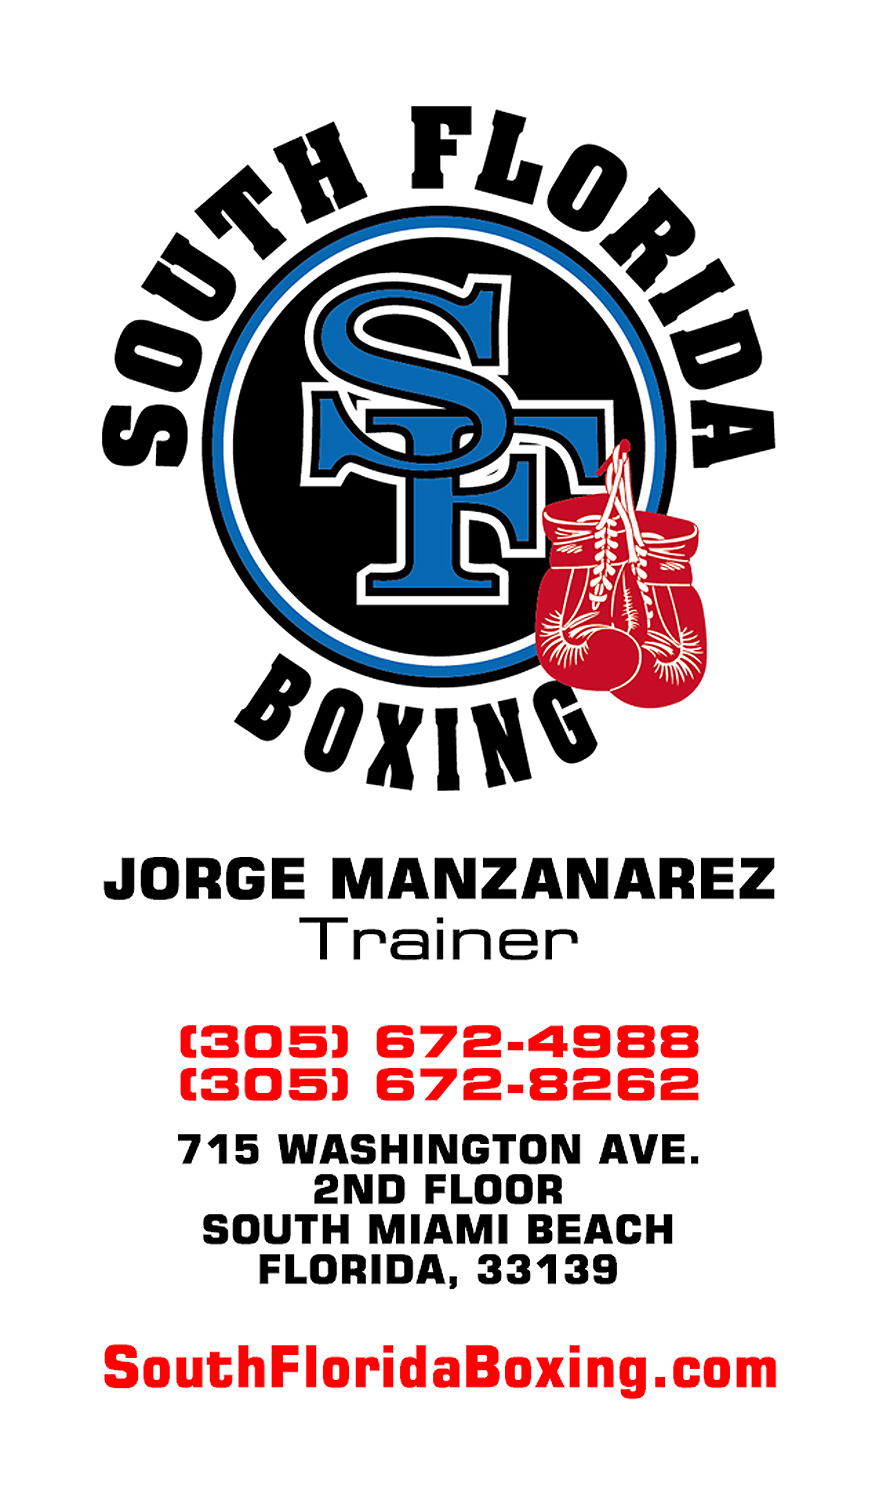 South Florida Boxing with Jorge Manzanarez